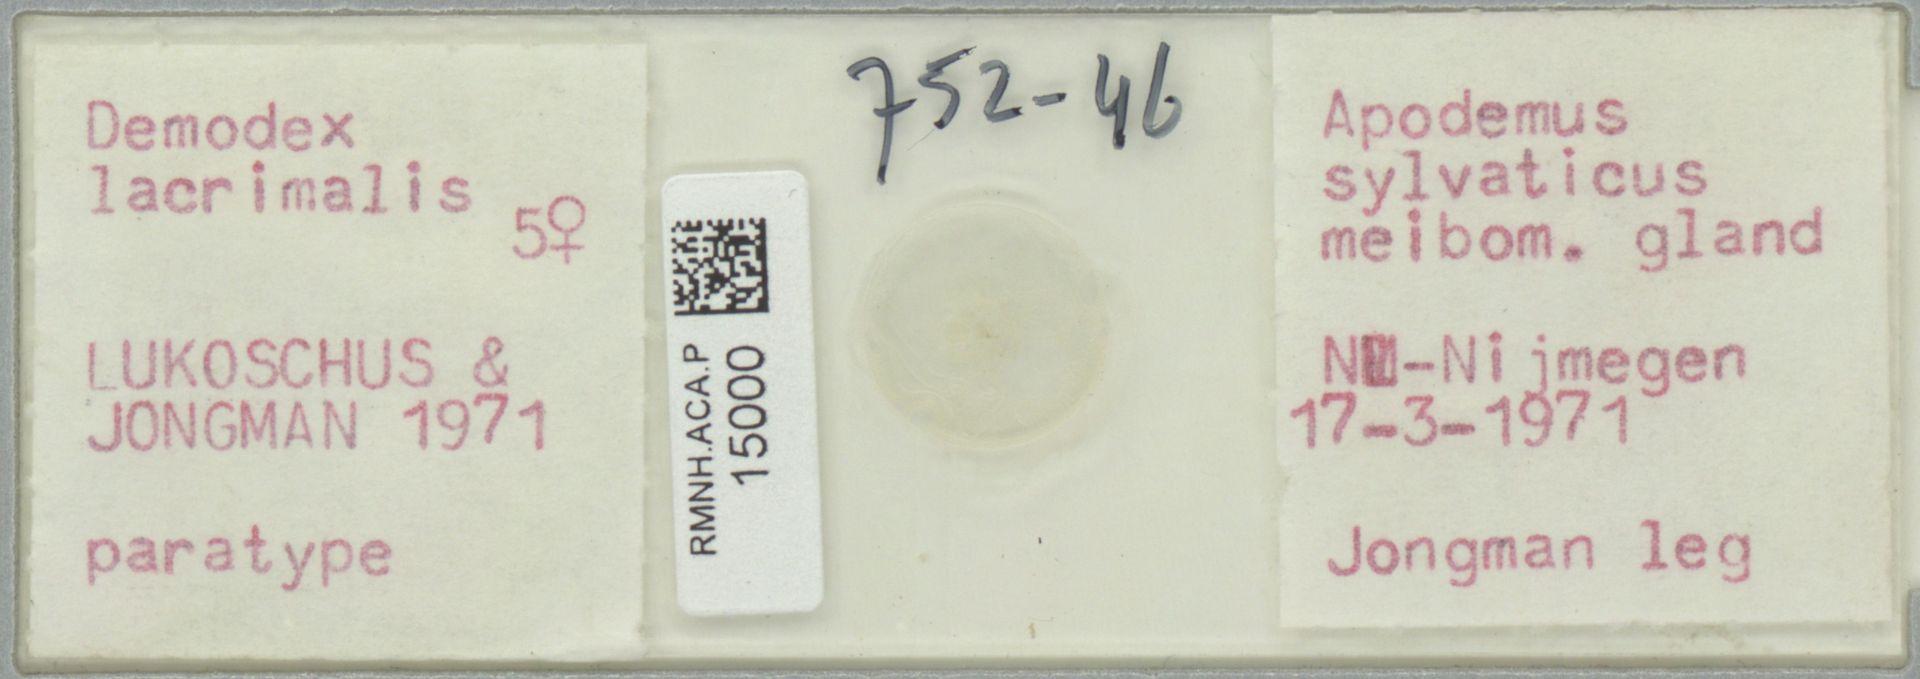 RMNH.ACA.P.15000 | Demodex lacrimalis Lukoschus & Jongman, 1971